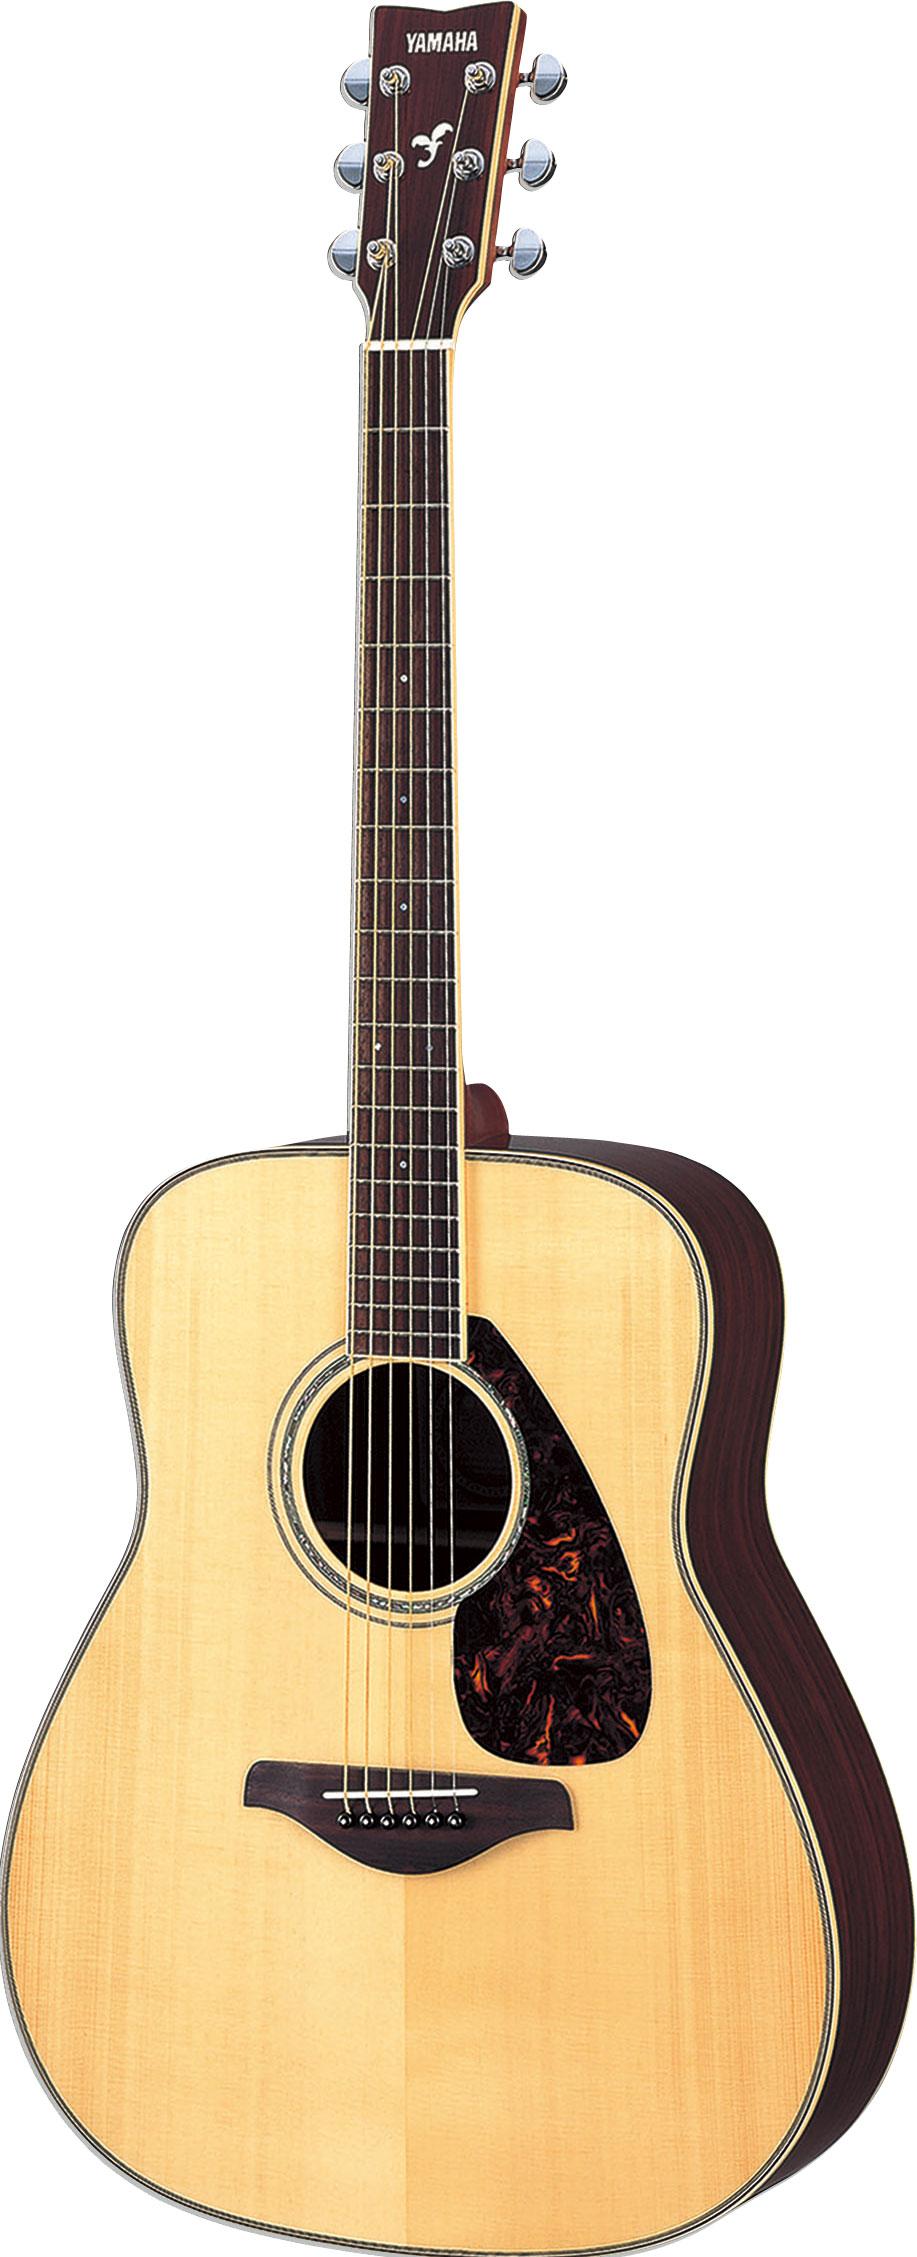 YAMAHA FG730S吉他